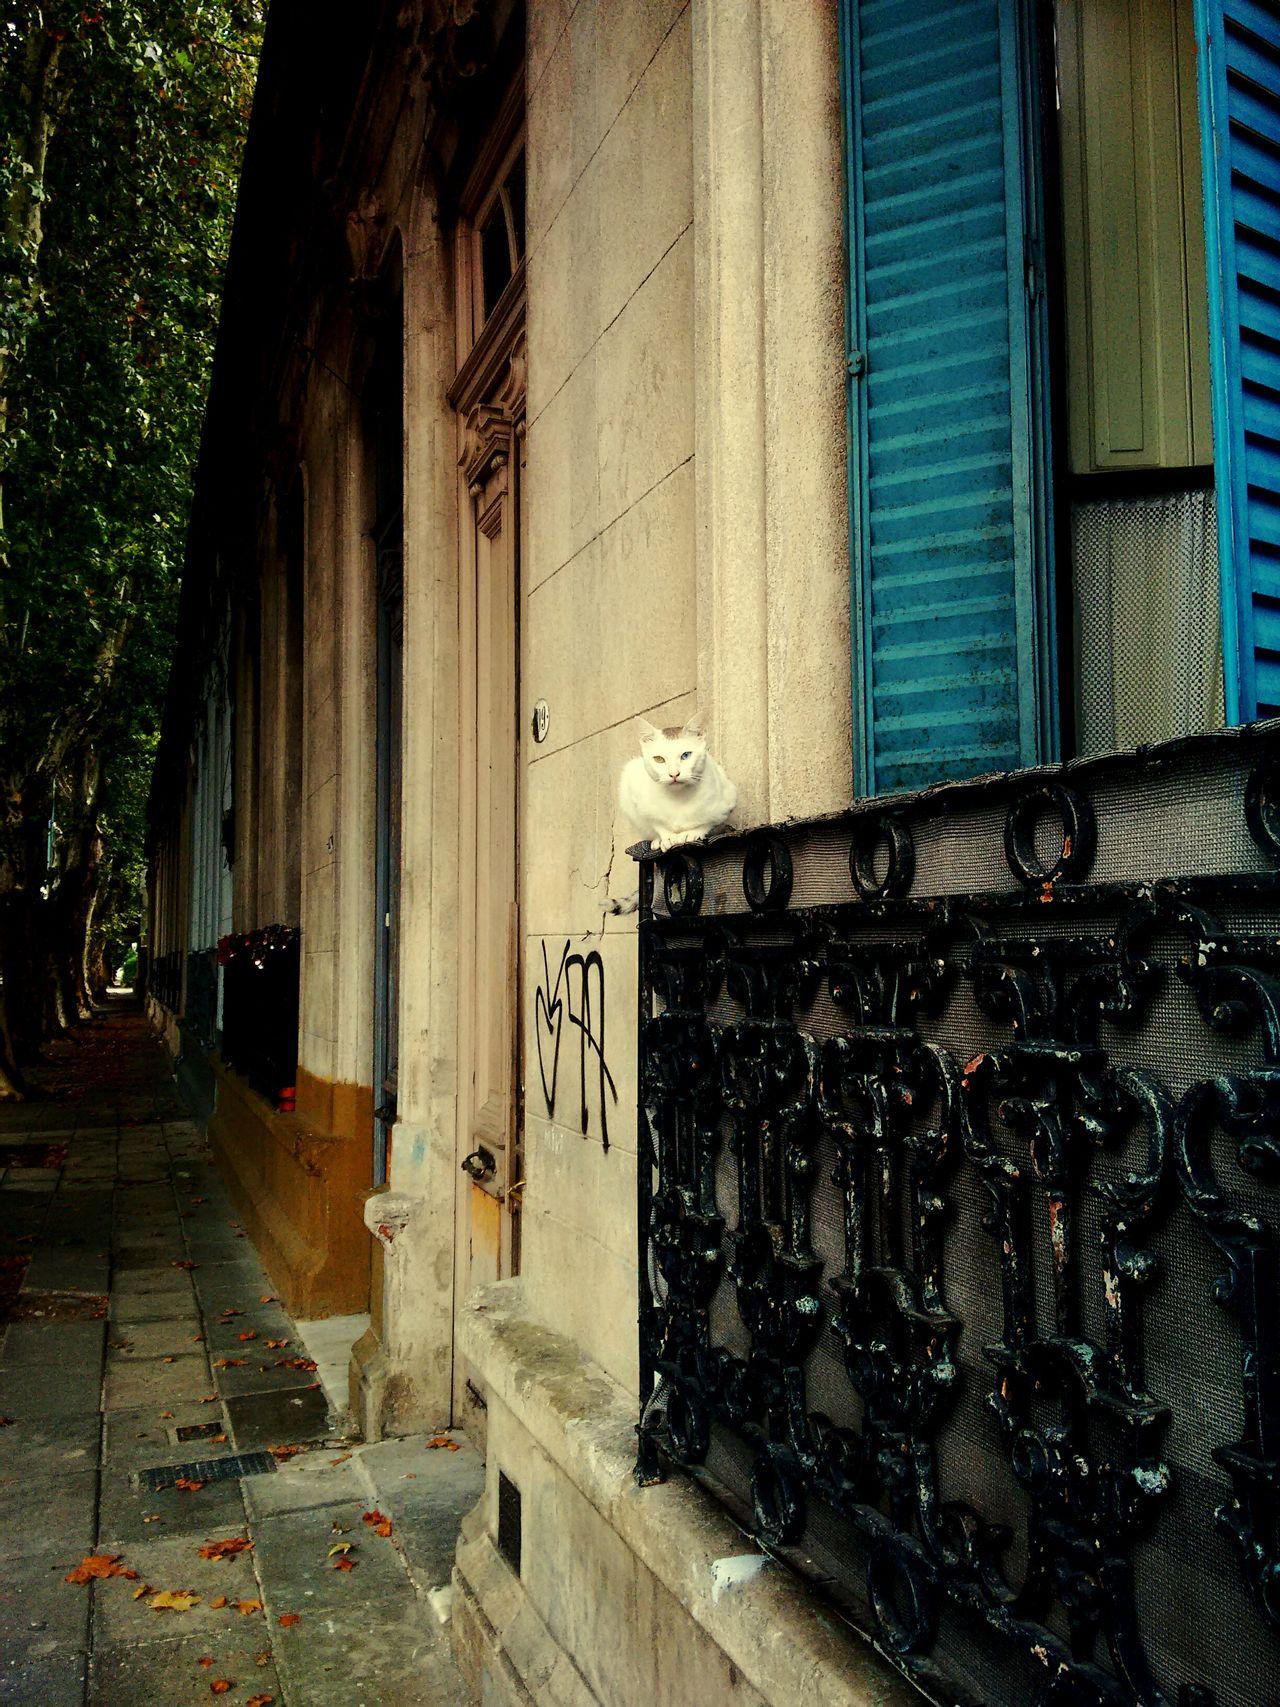 Cat Catlovers Villacrespo Buenosaires Argentina Bue